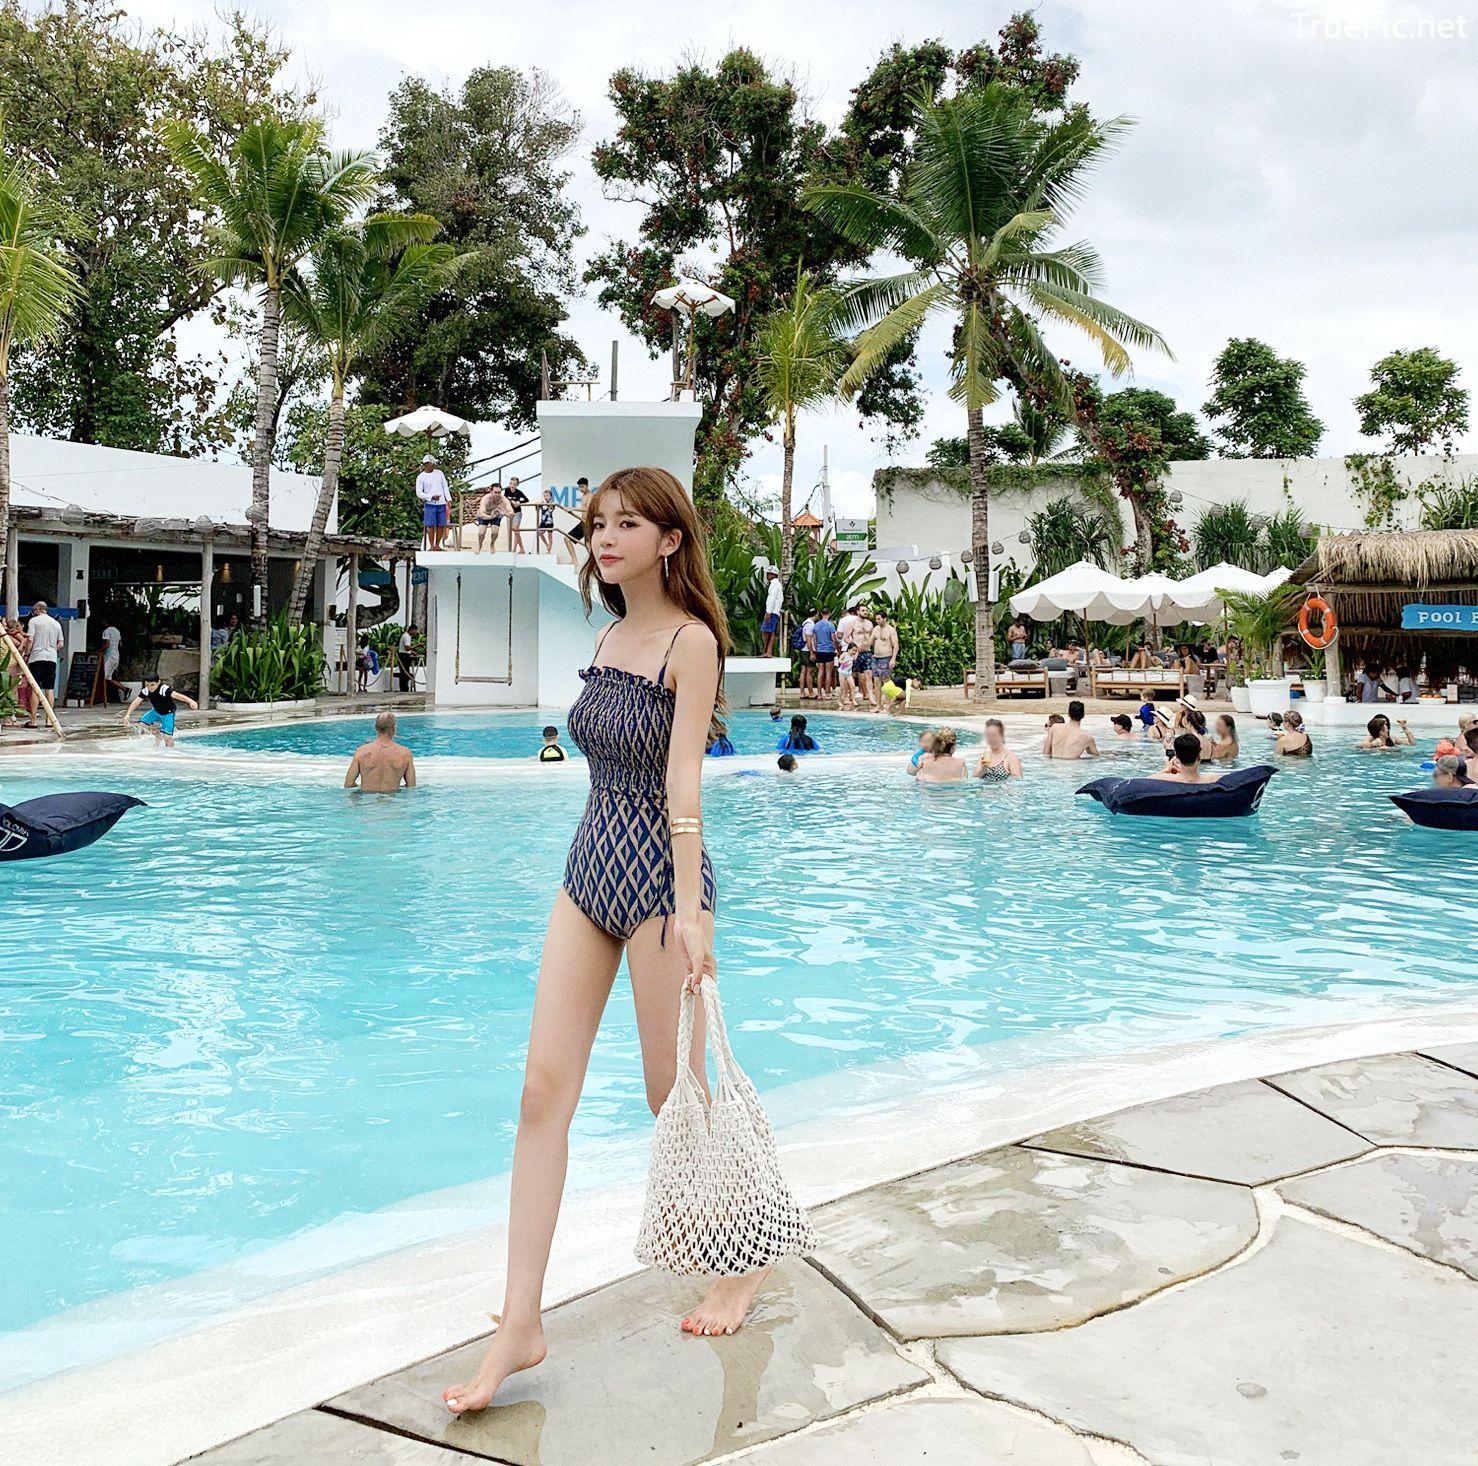 Image Korean Fashion Model - Cha Yoo Jin - Diamond Smoke Monokini - TruePic.net - Picture-10